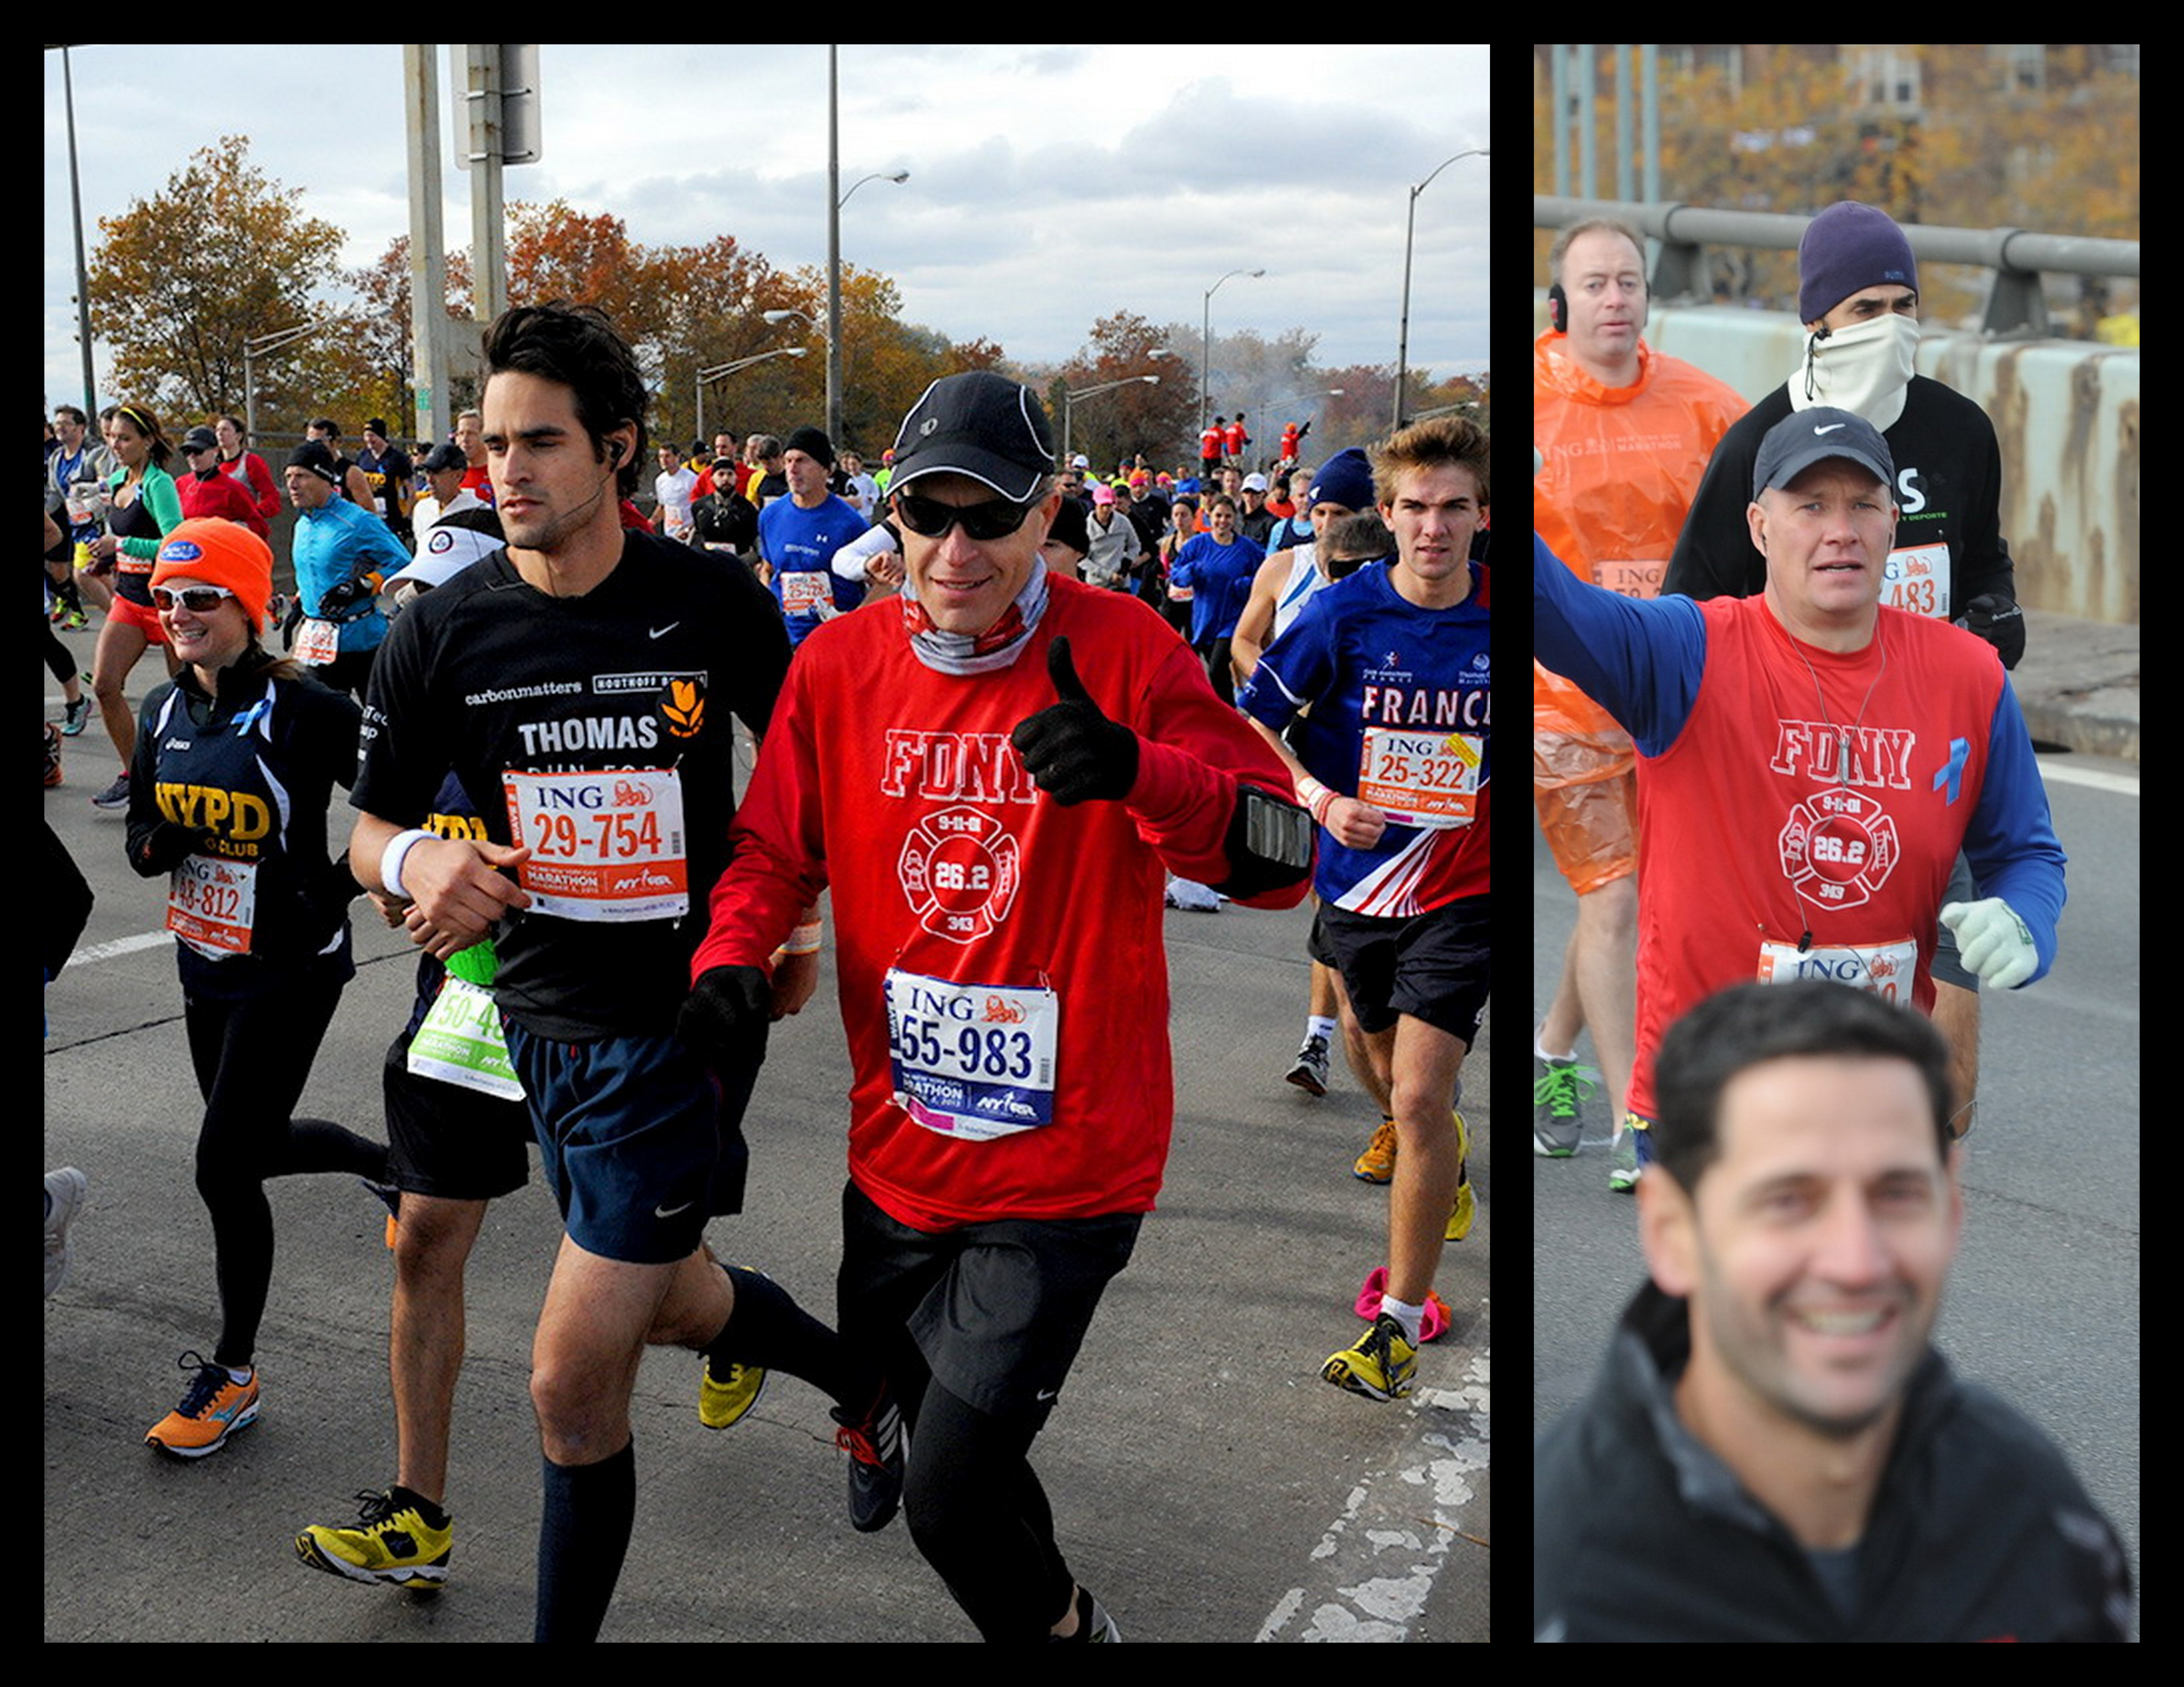 FDNY NYC Marathon.Runners.2013.collage